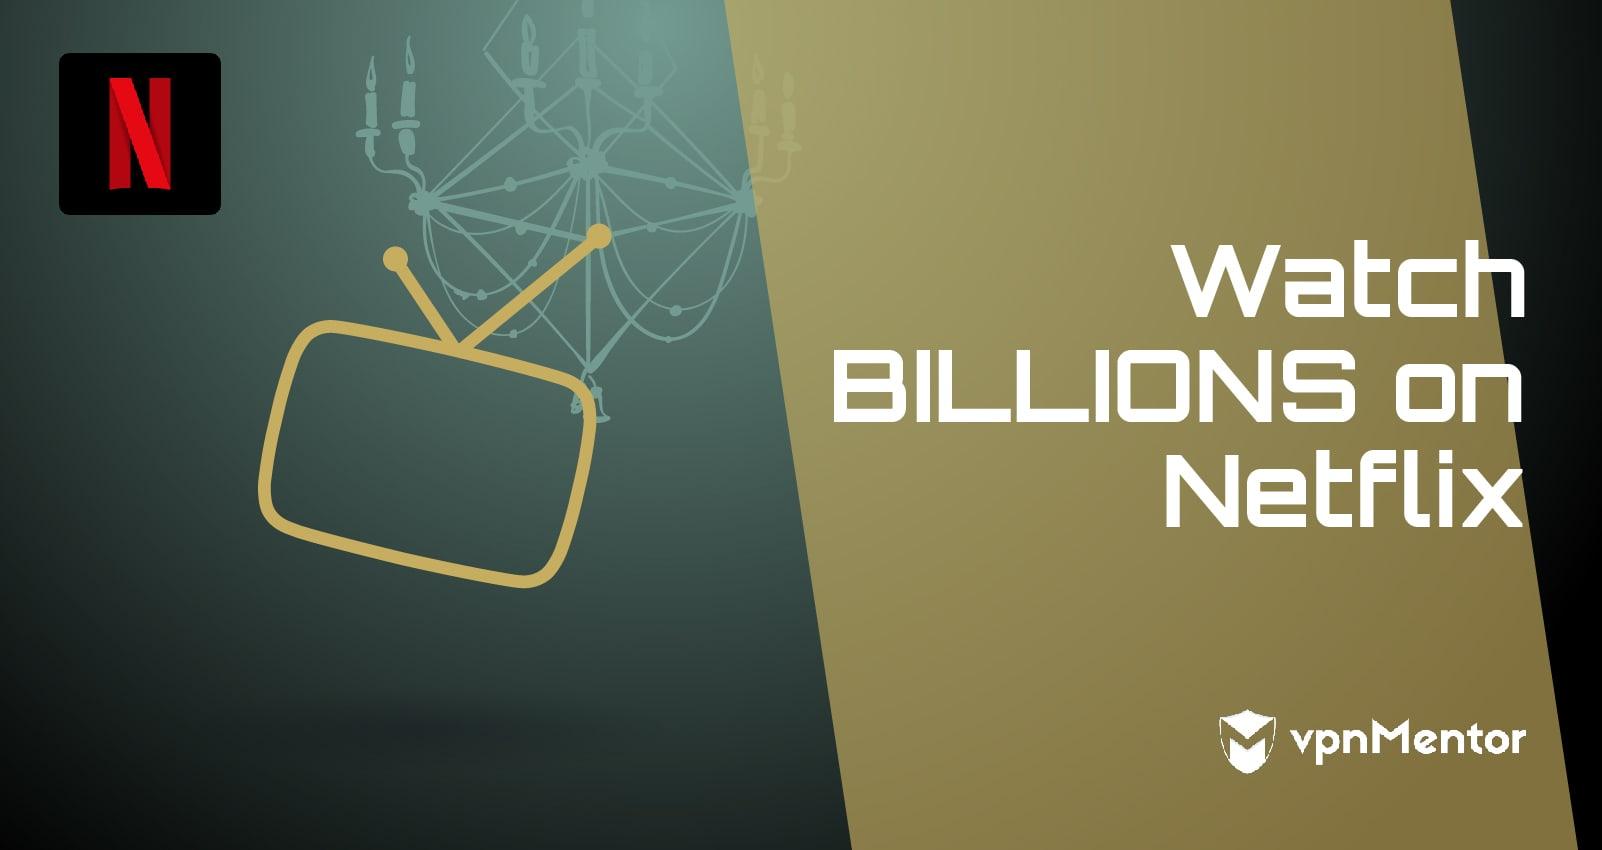 Watch Billions on Netflix